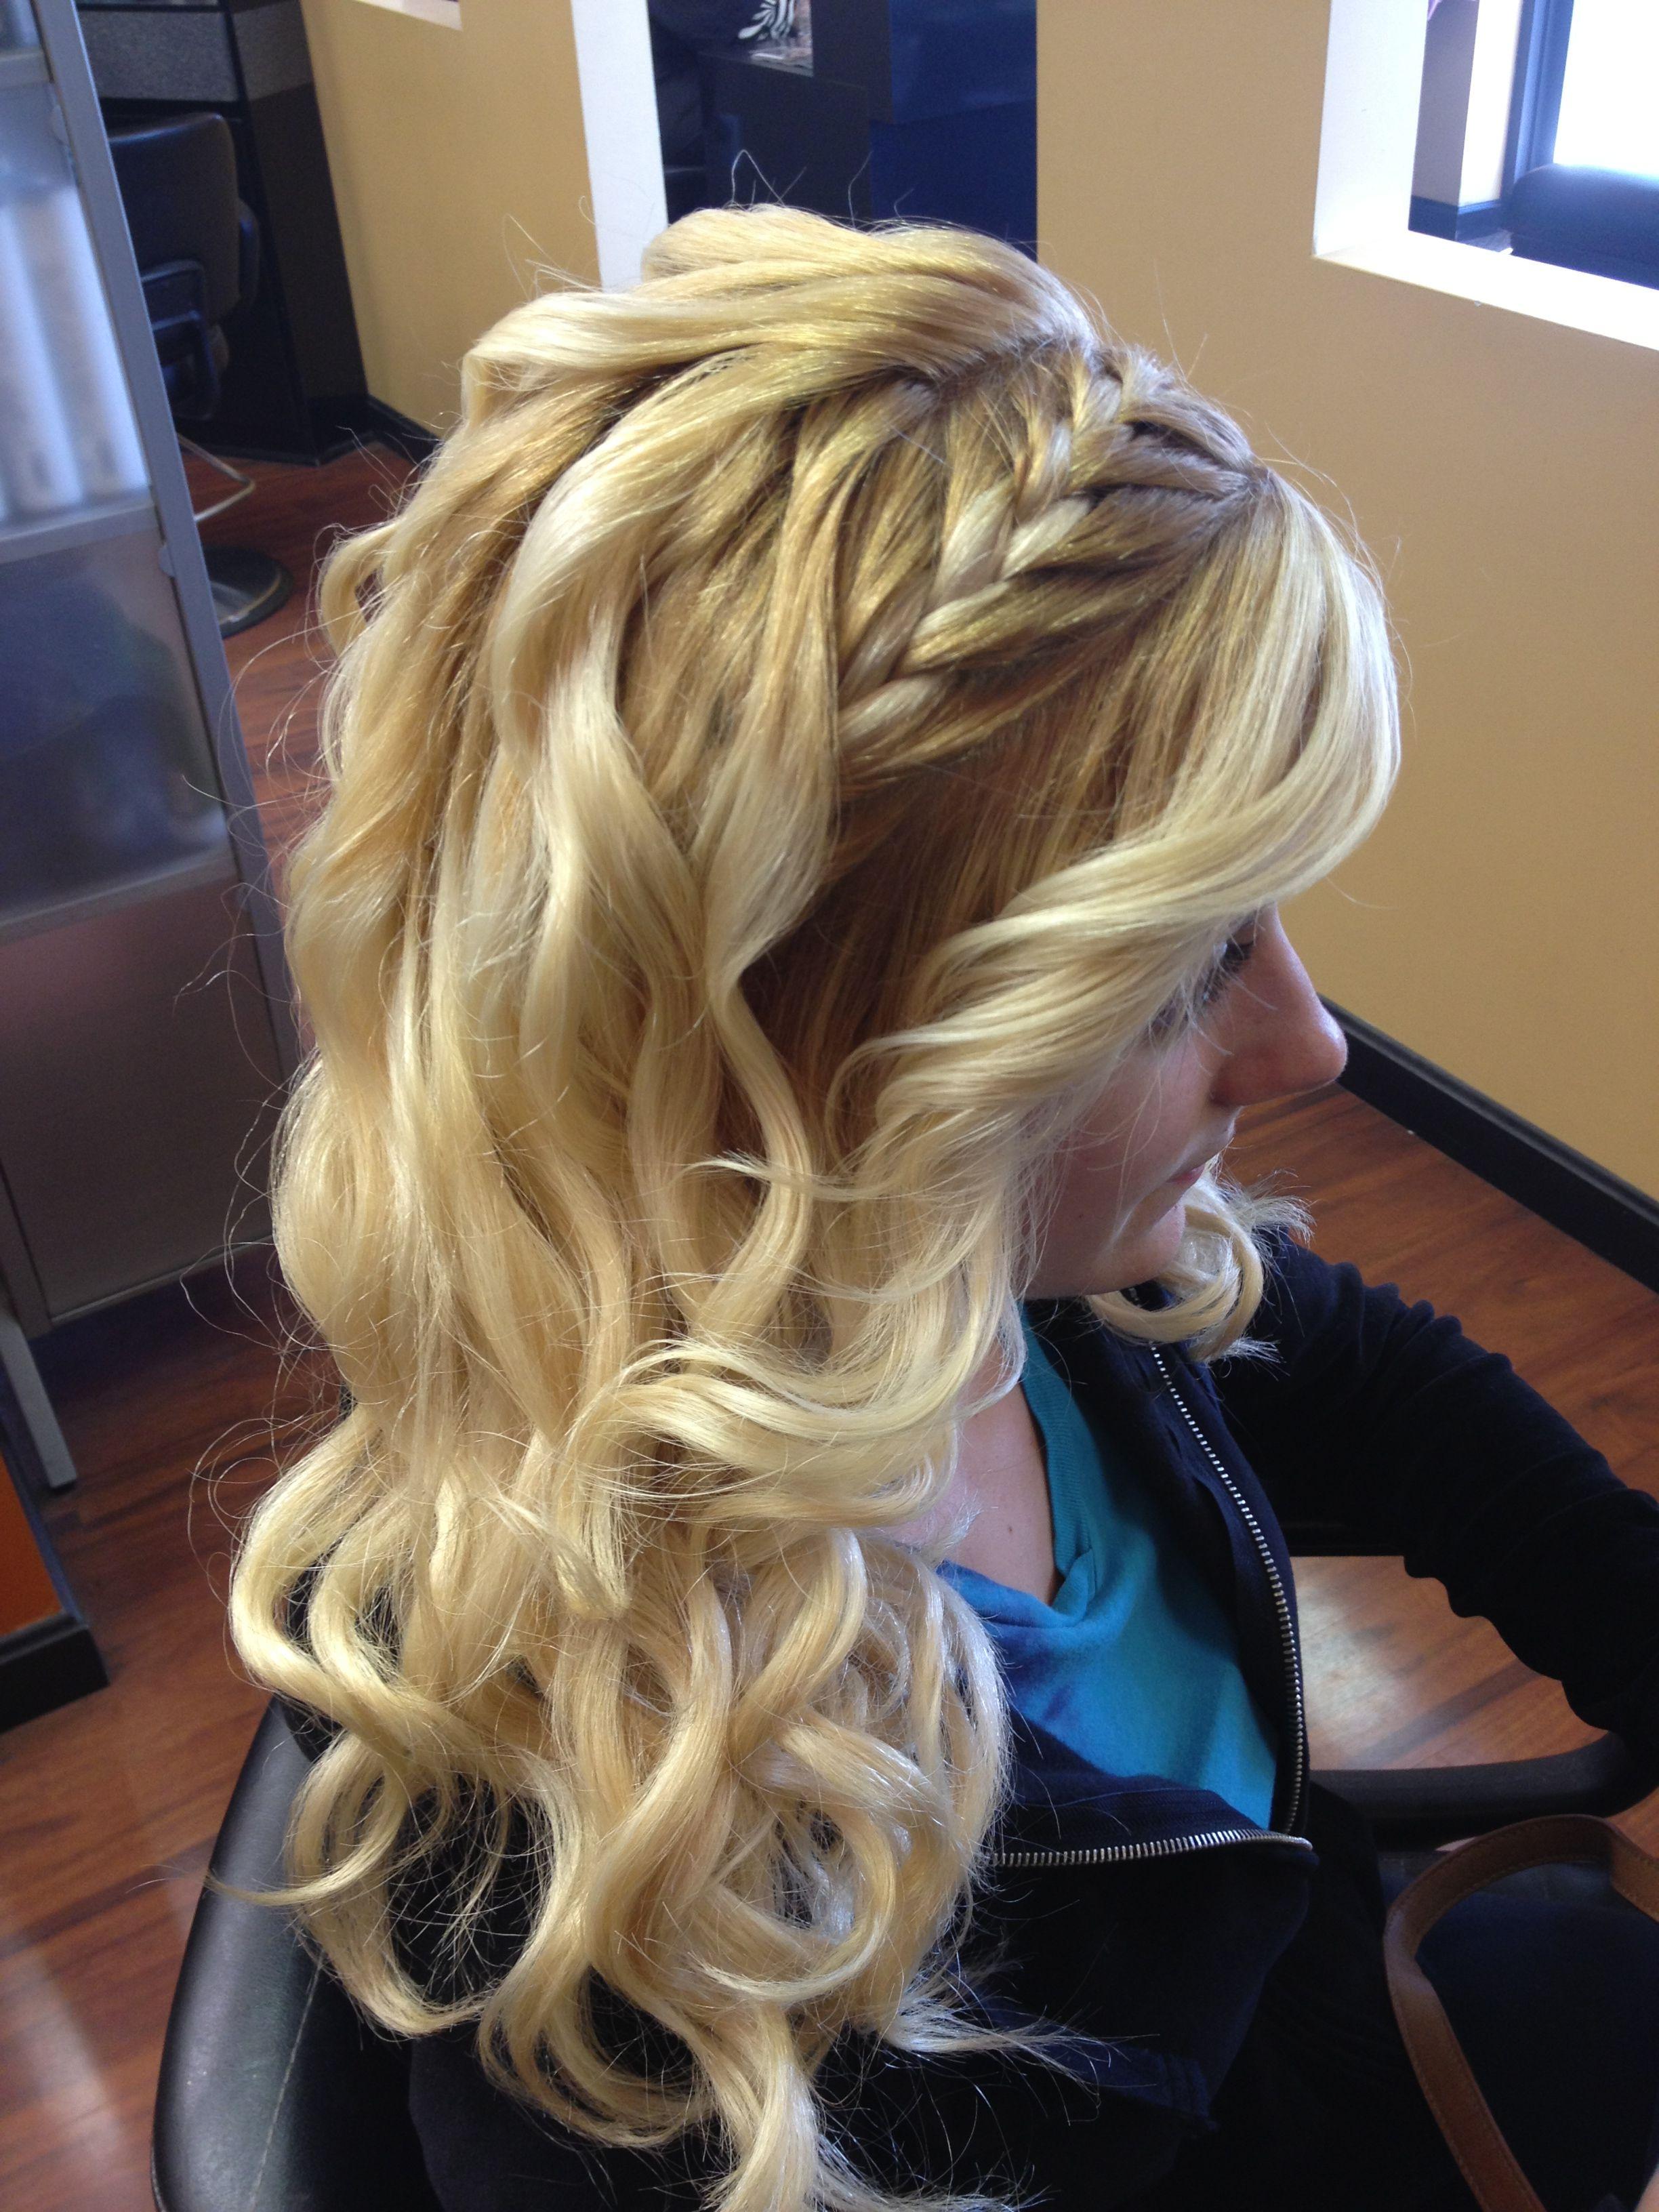 Braid curls hairstyles pinterest homecoming hair hair style